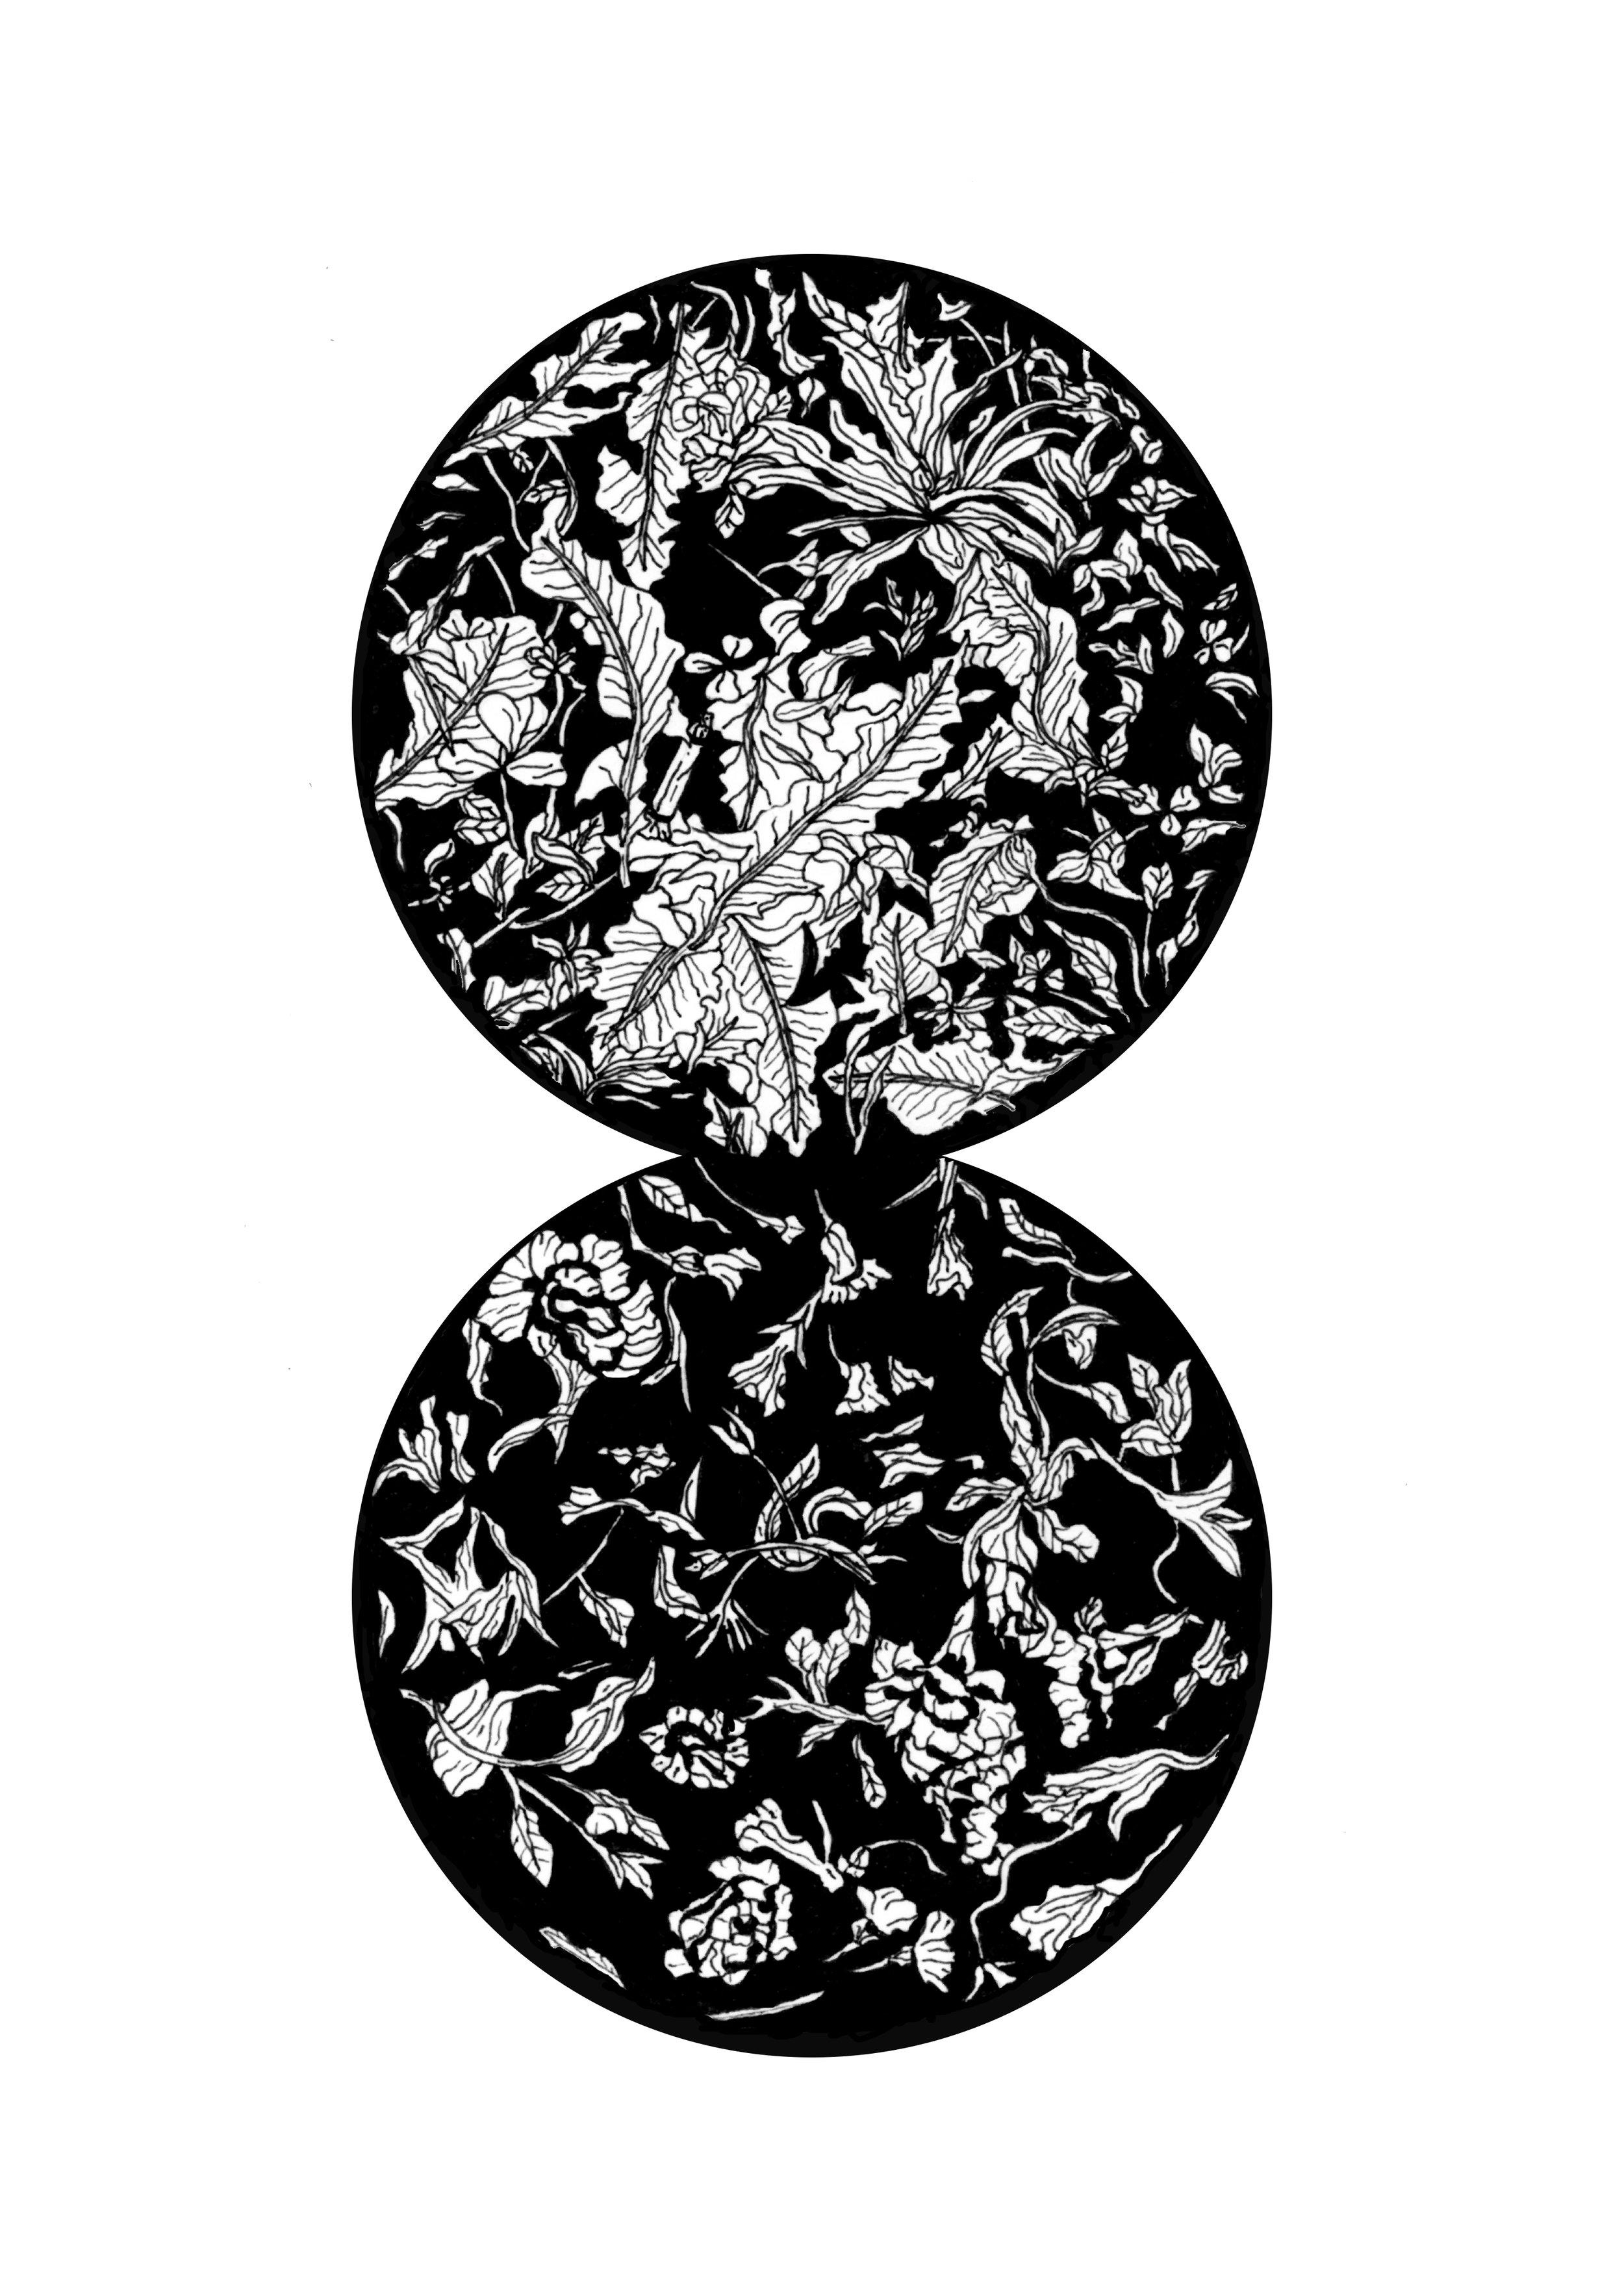 We Were Here: Cigarette/Deadheads | NATALIE VESTIN  Ink on paper, 4 1/2 x 6 in., 2016